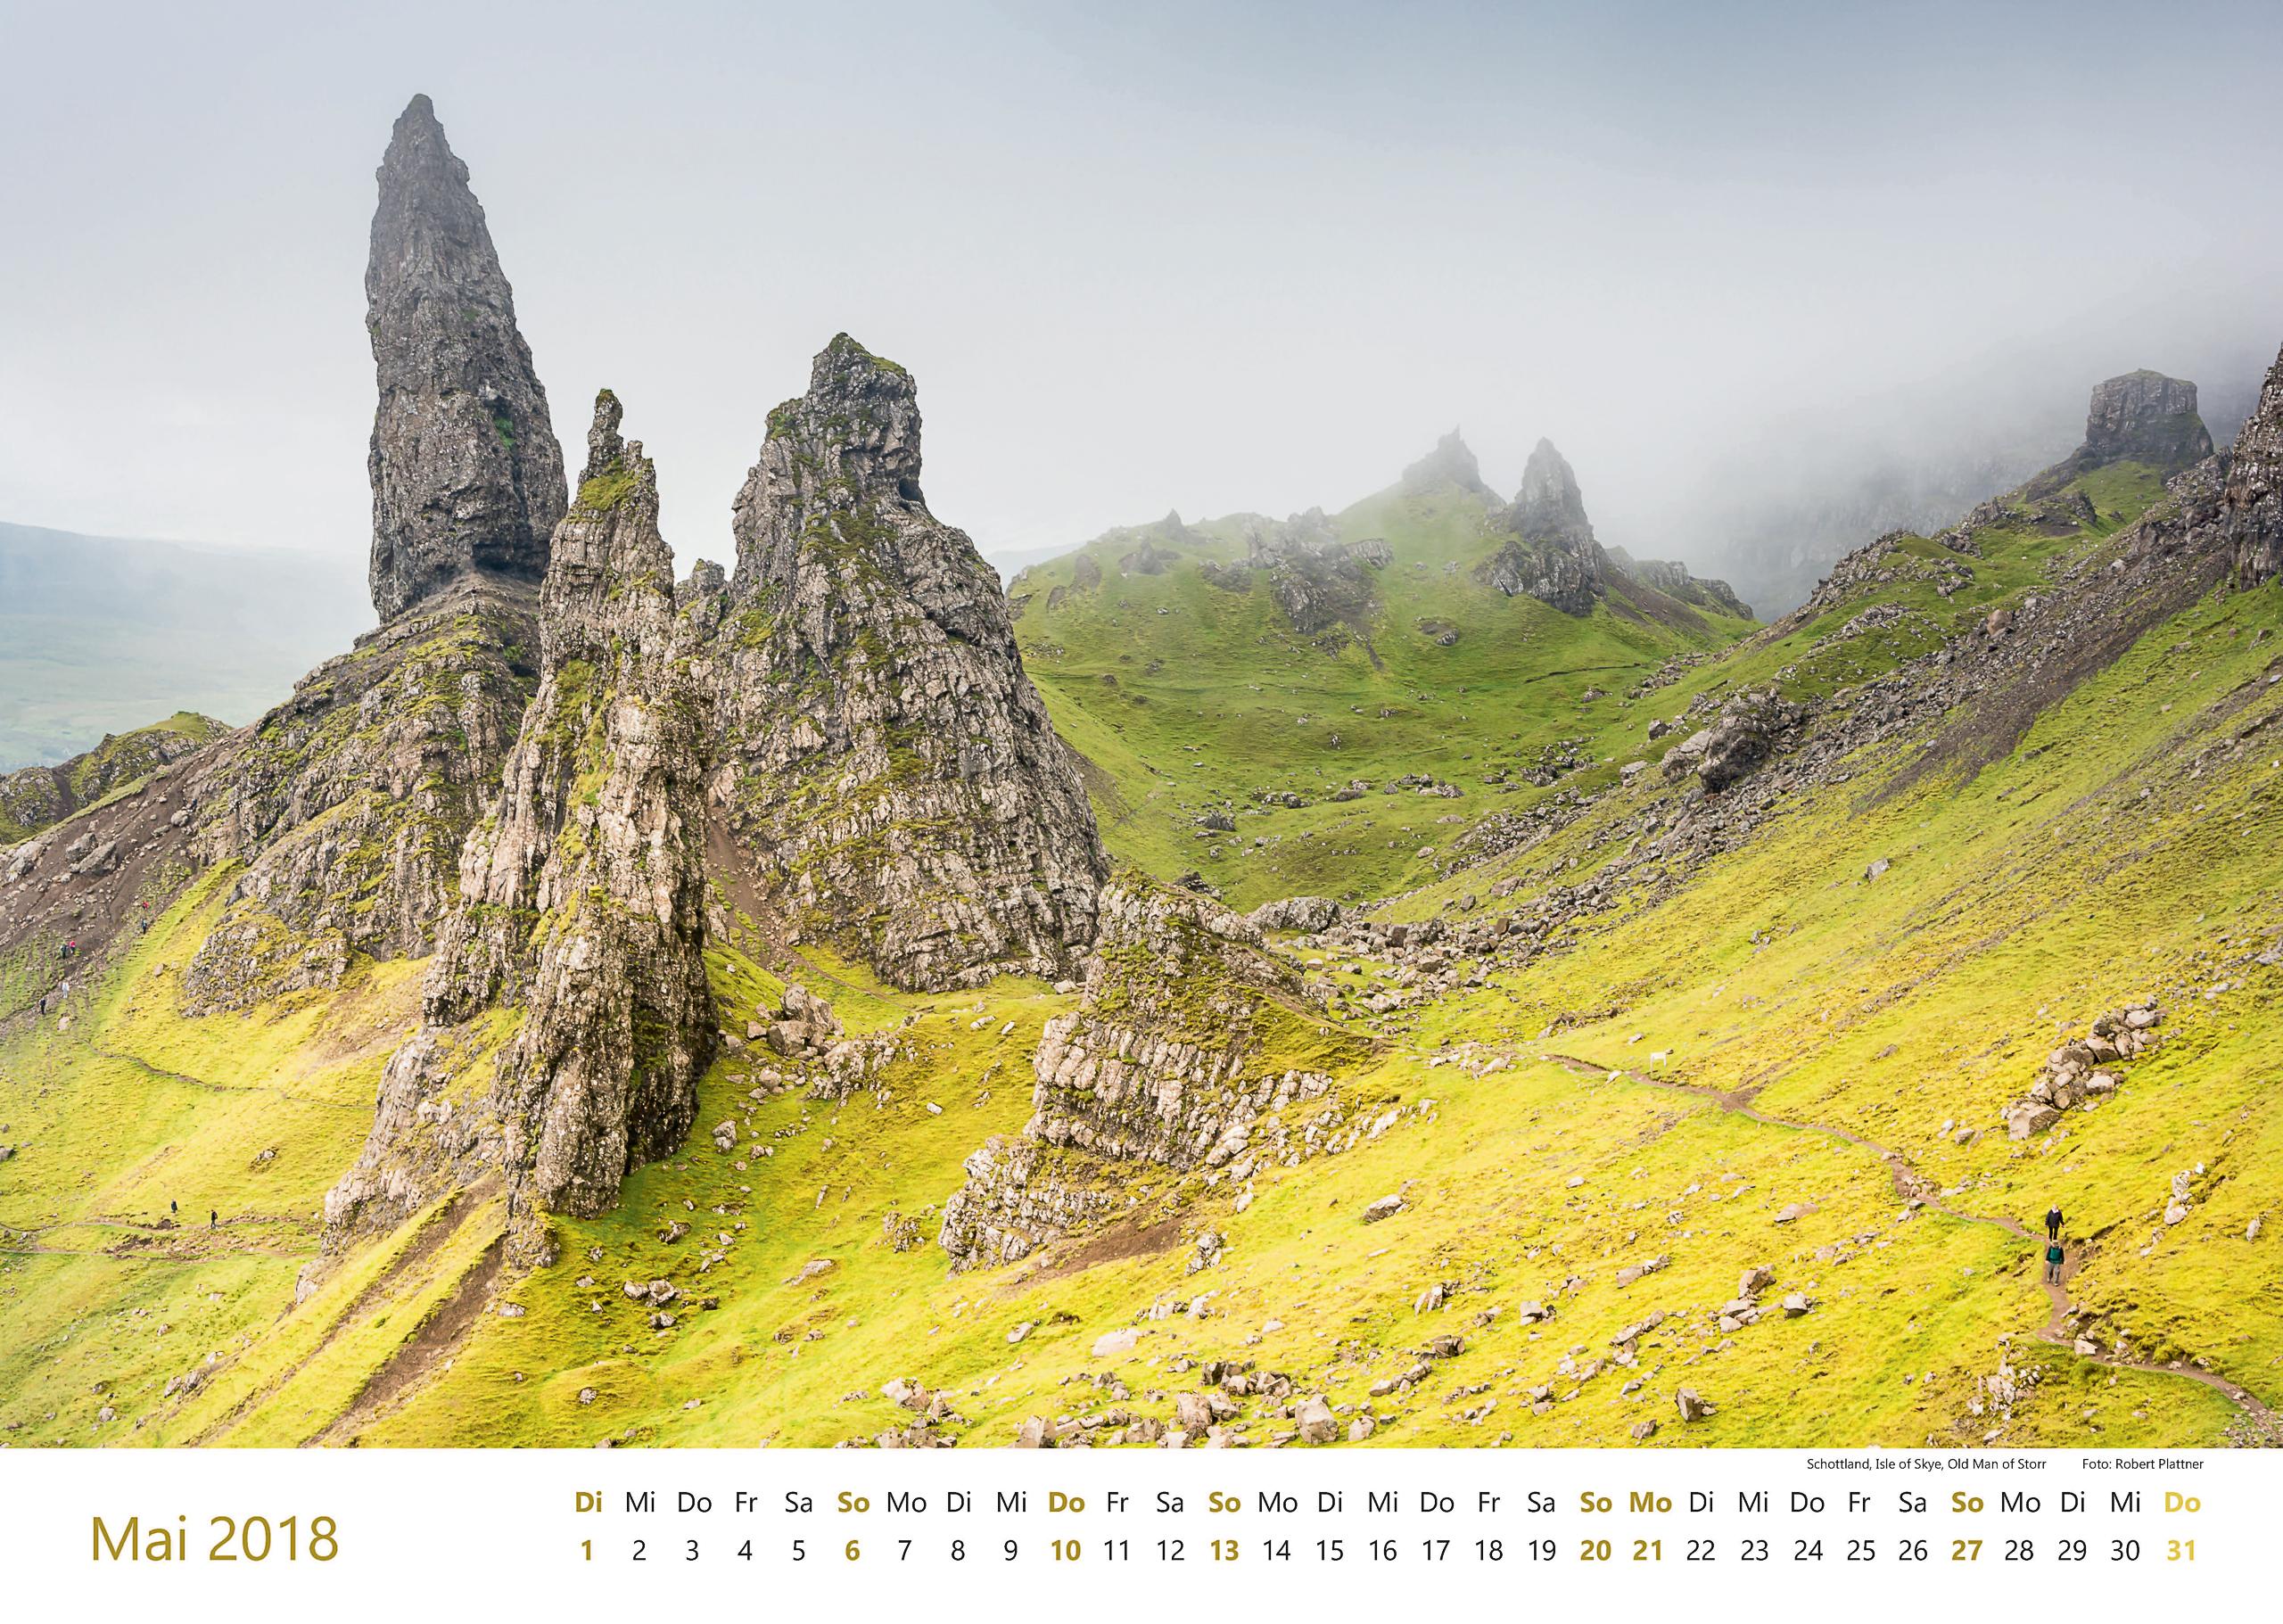 Schottland, Isle of Skye, Old Man of Storr